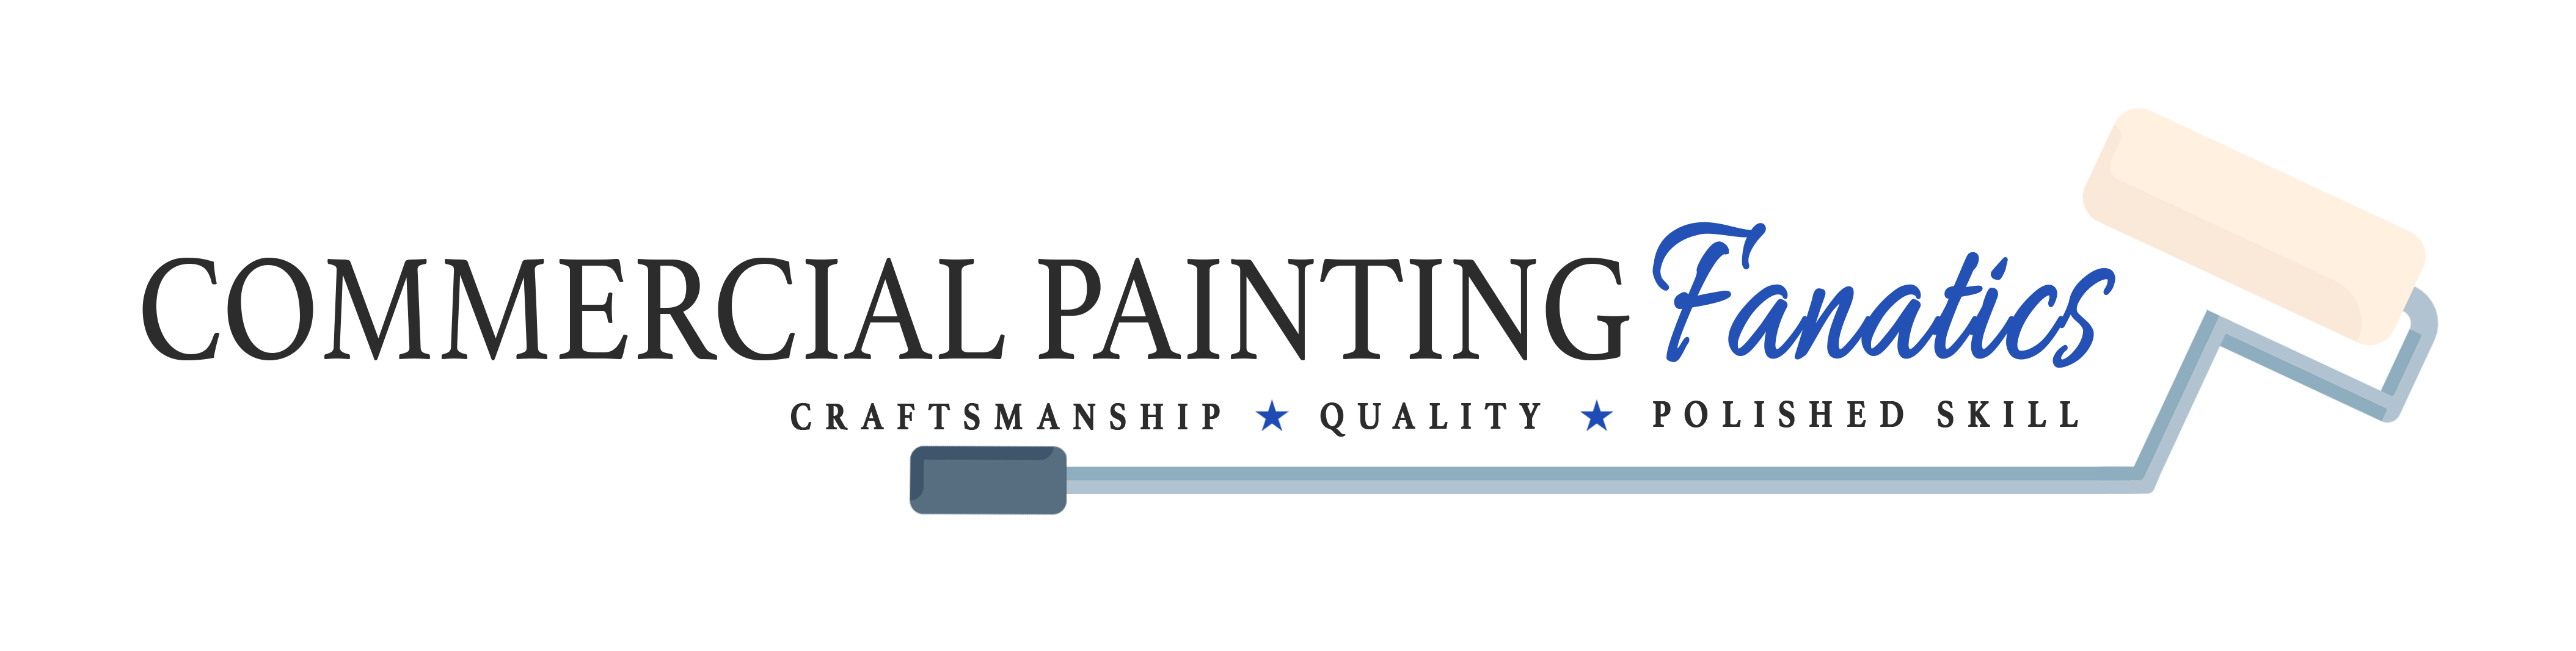 Commercial Painters St. Petersburg Florida